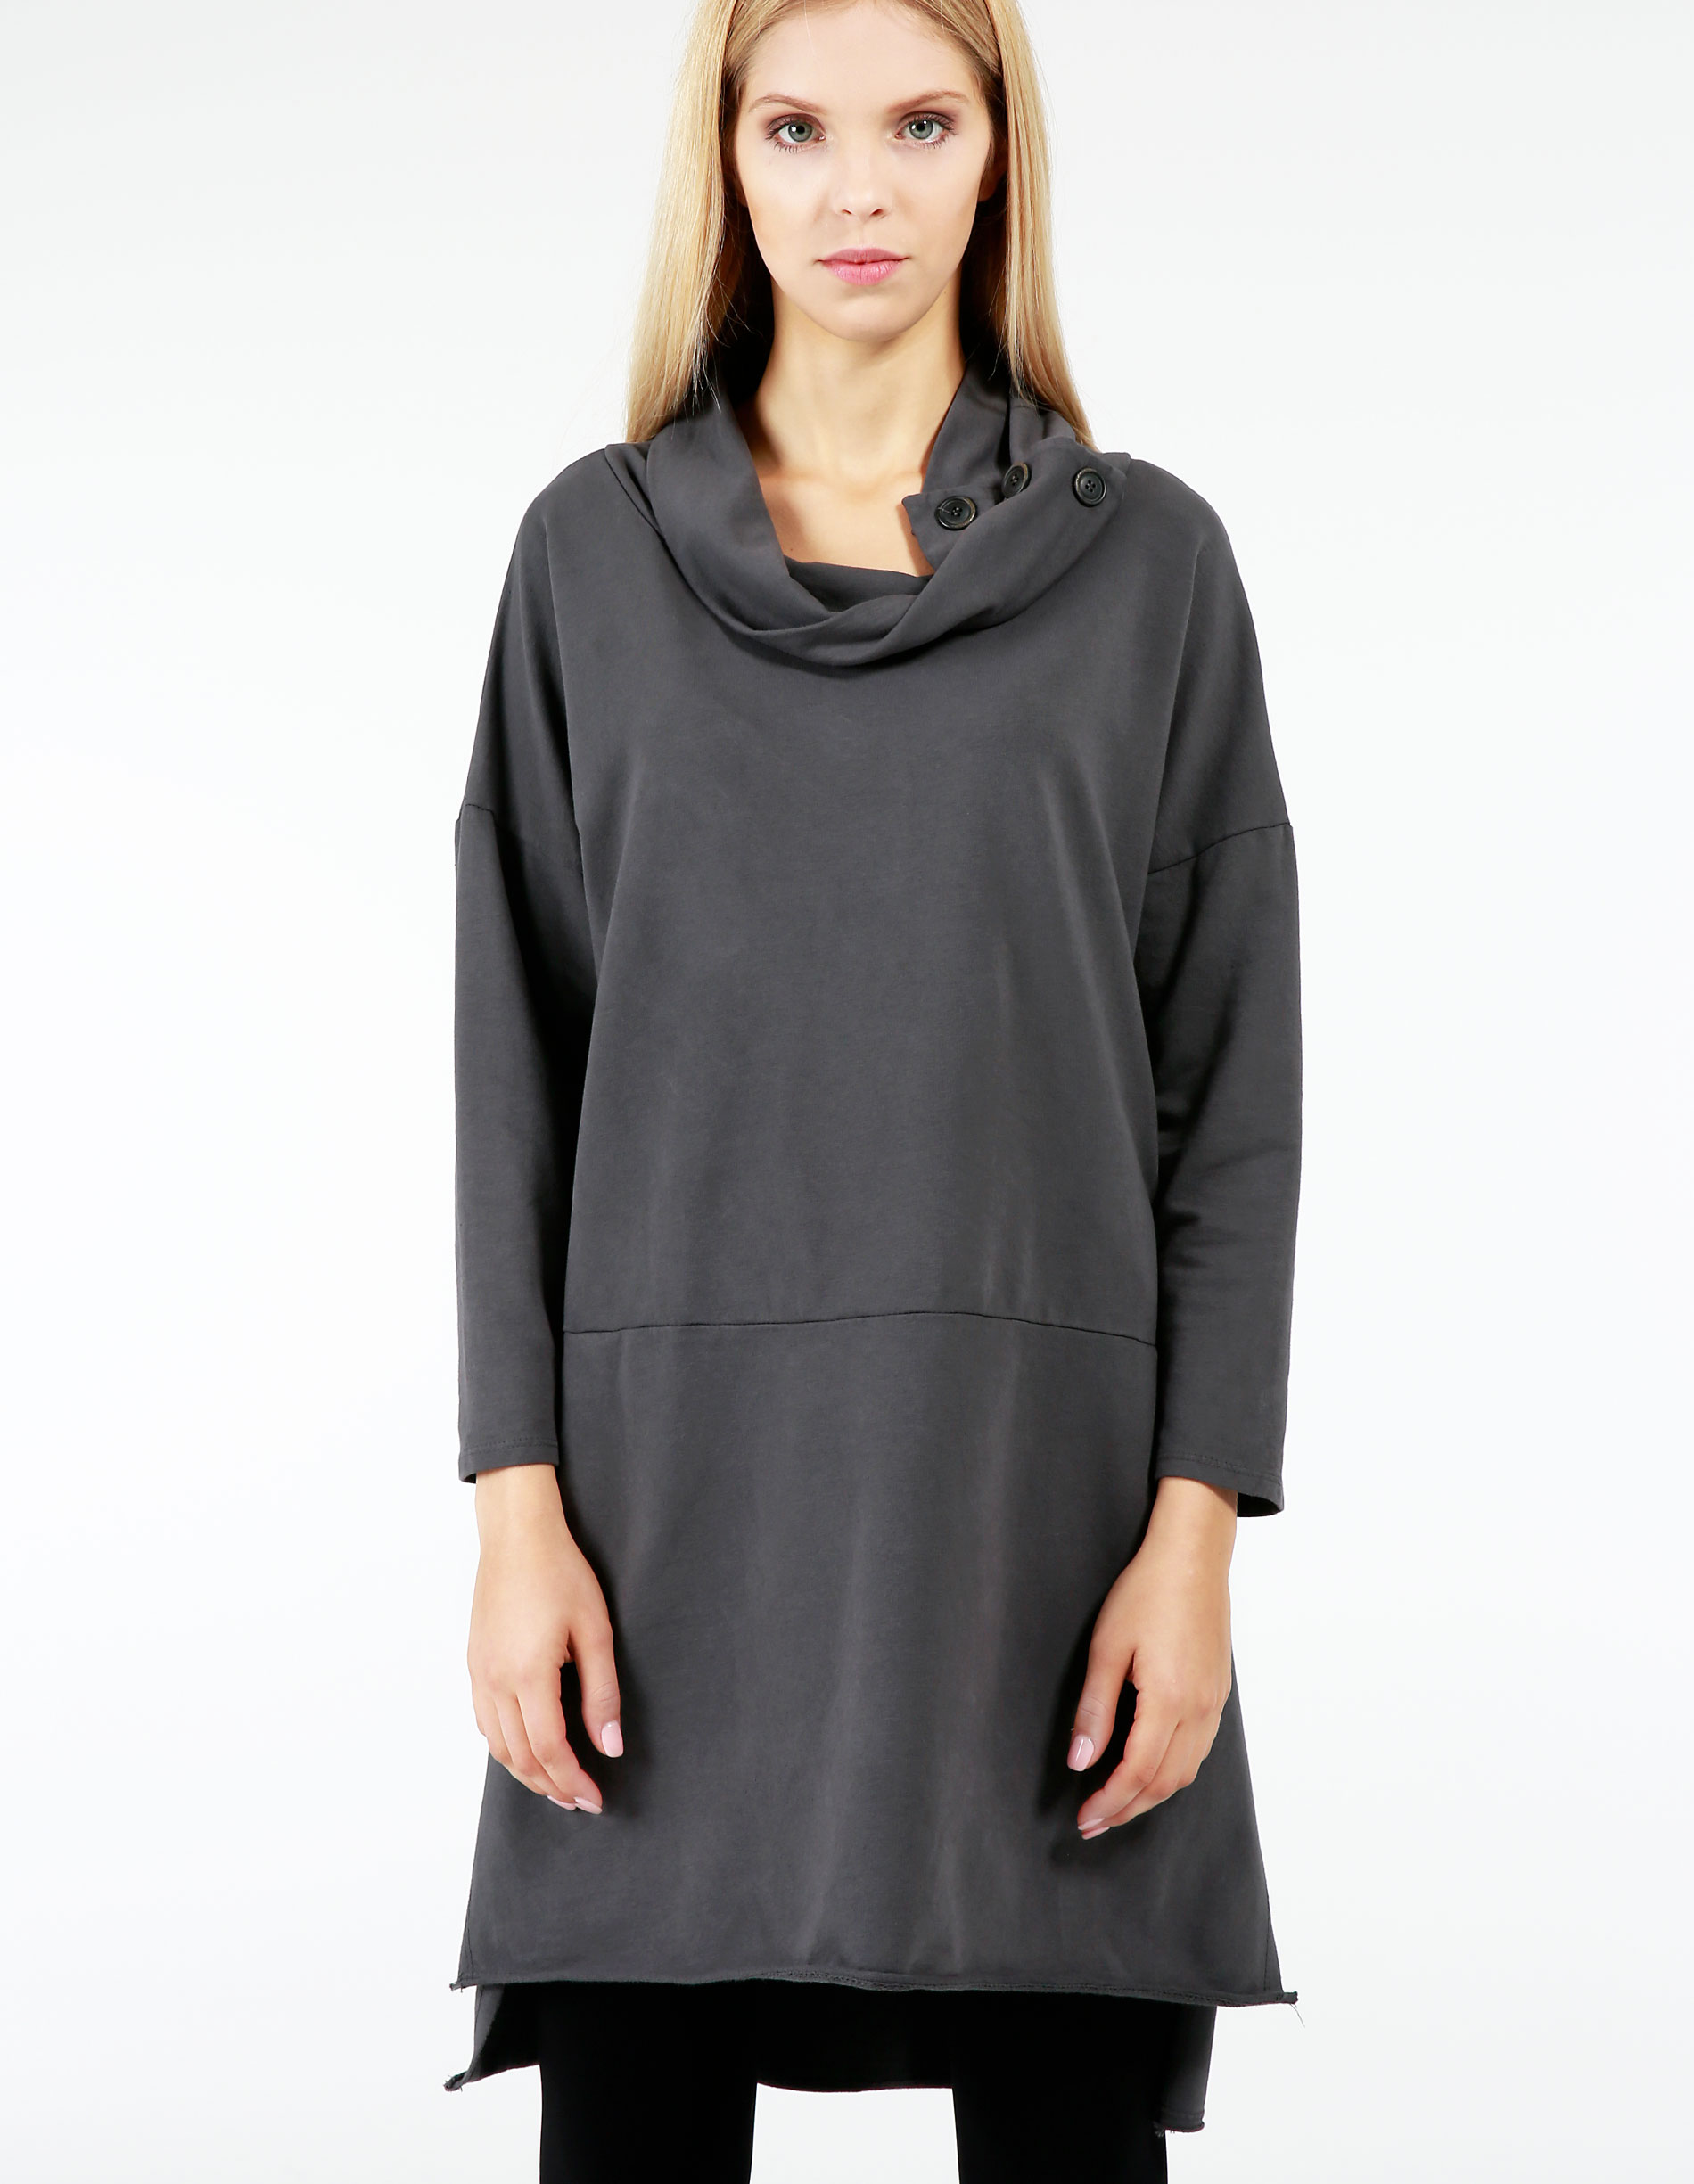 Sukienka - 119-173390 PI - Unisono